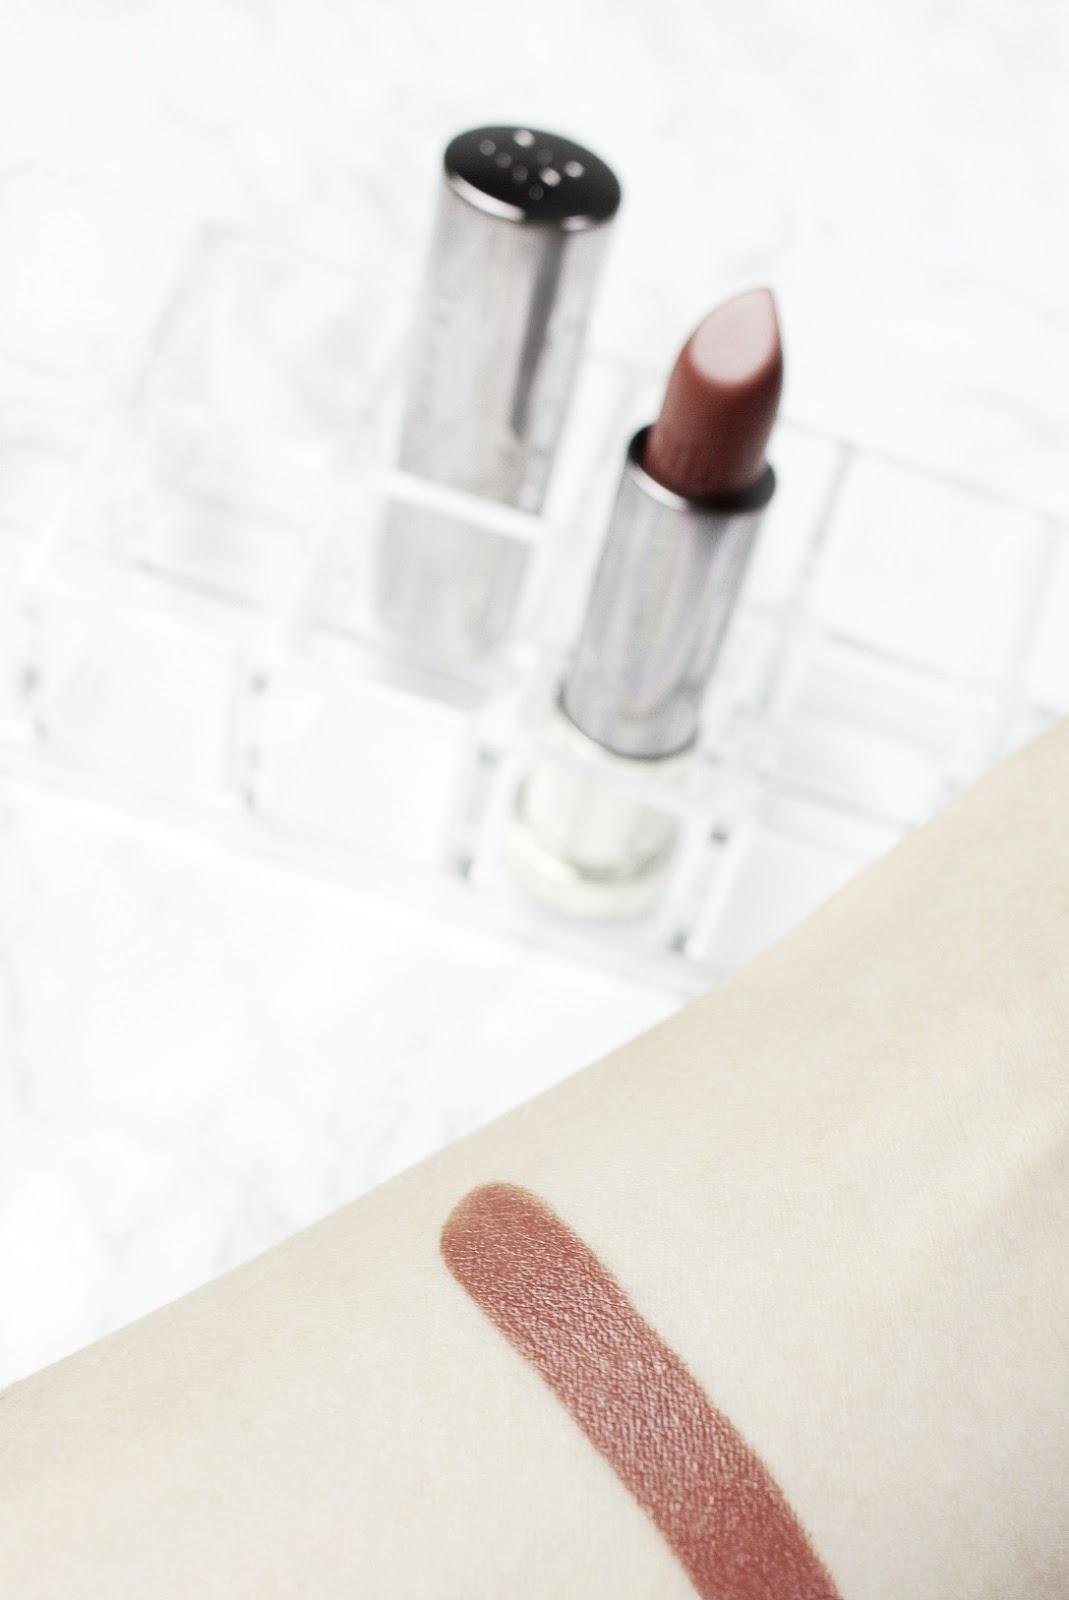 Urban Decay Vice Lipstick Backseat Swatch